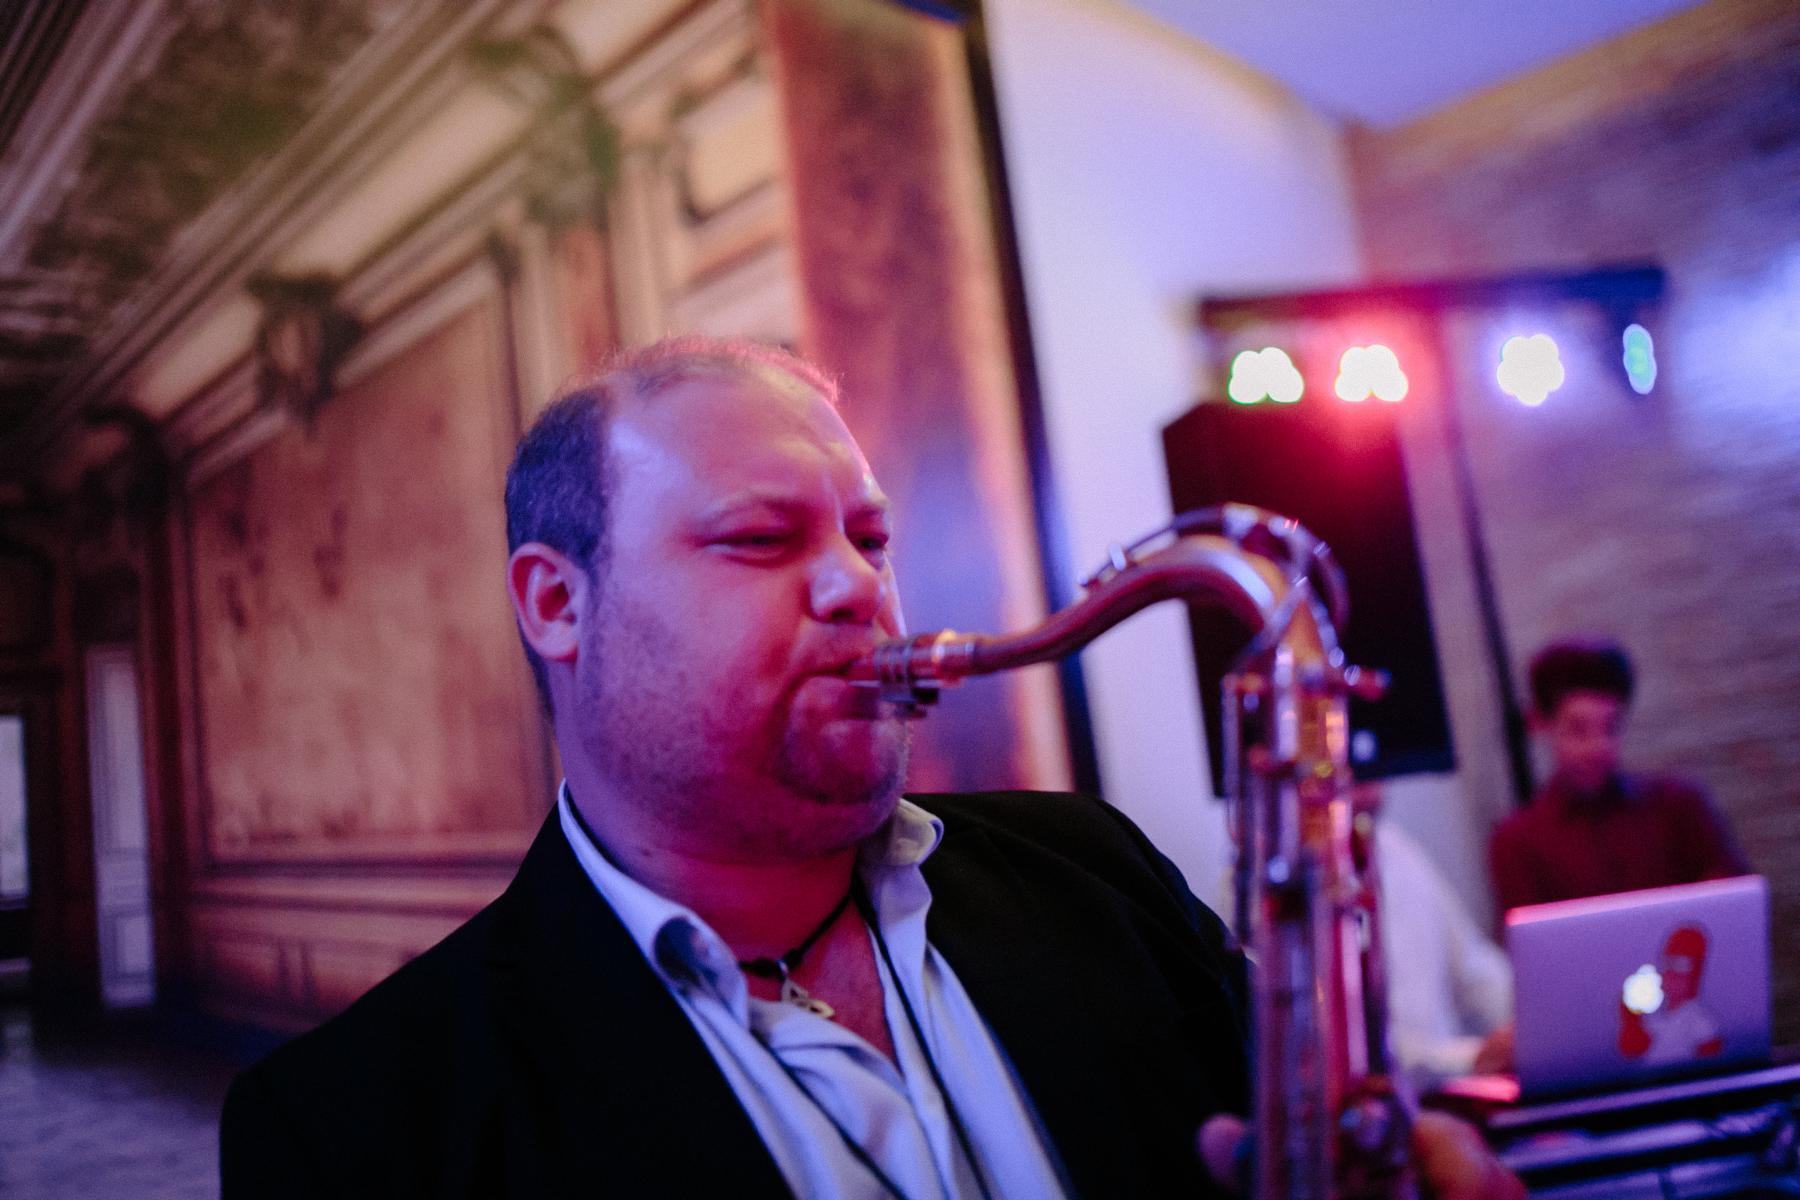 Saxofonspieler bei Hochzeitsfeier